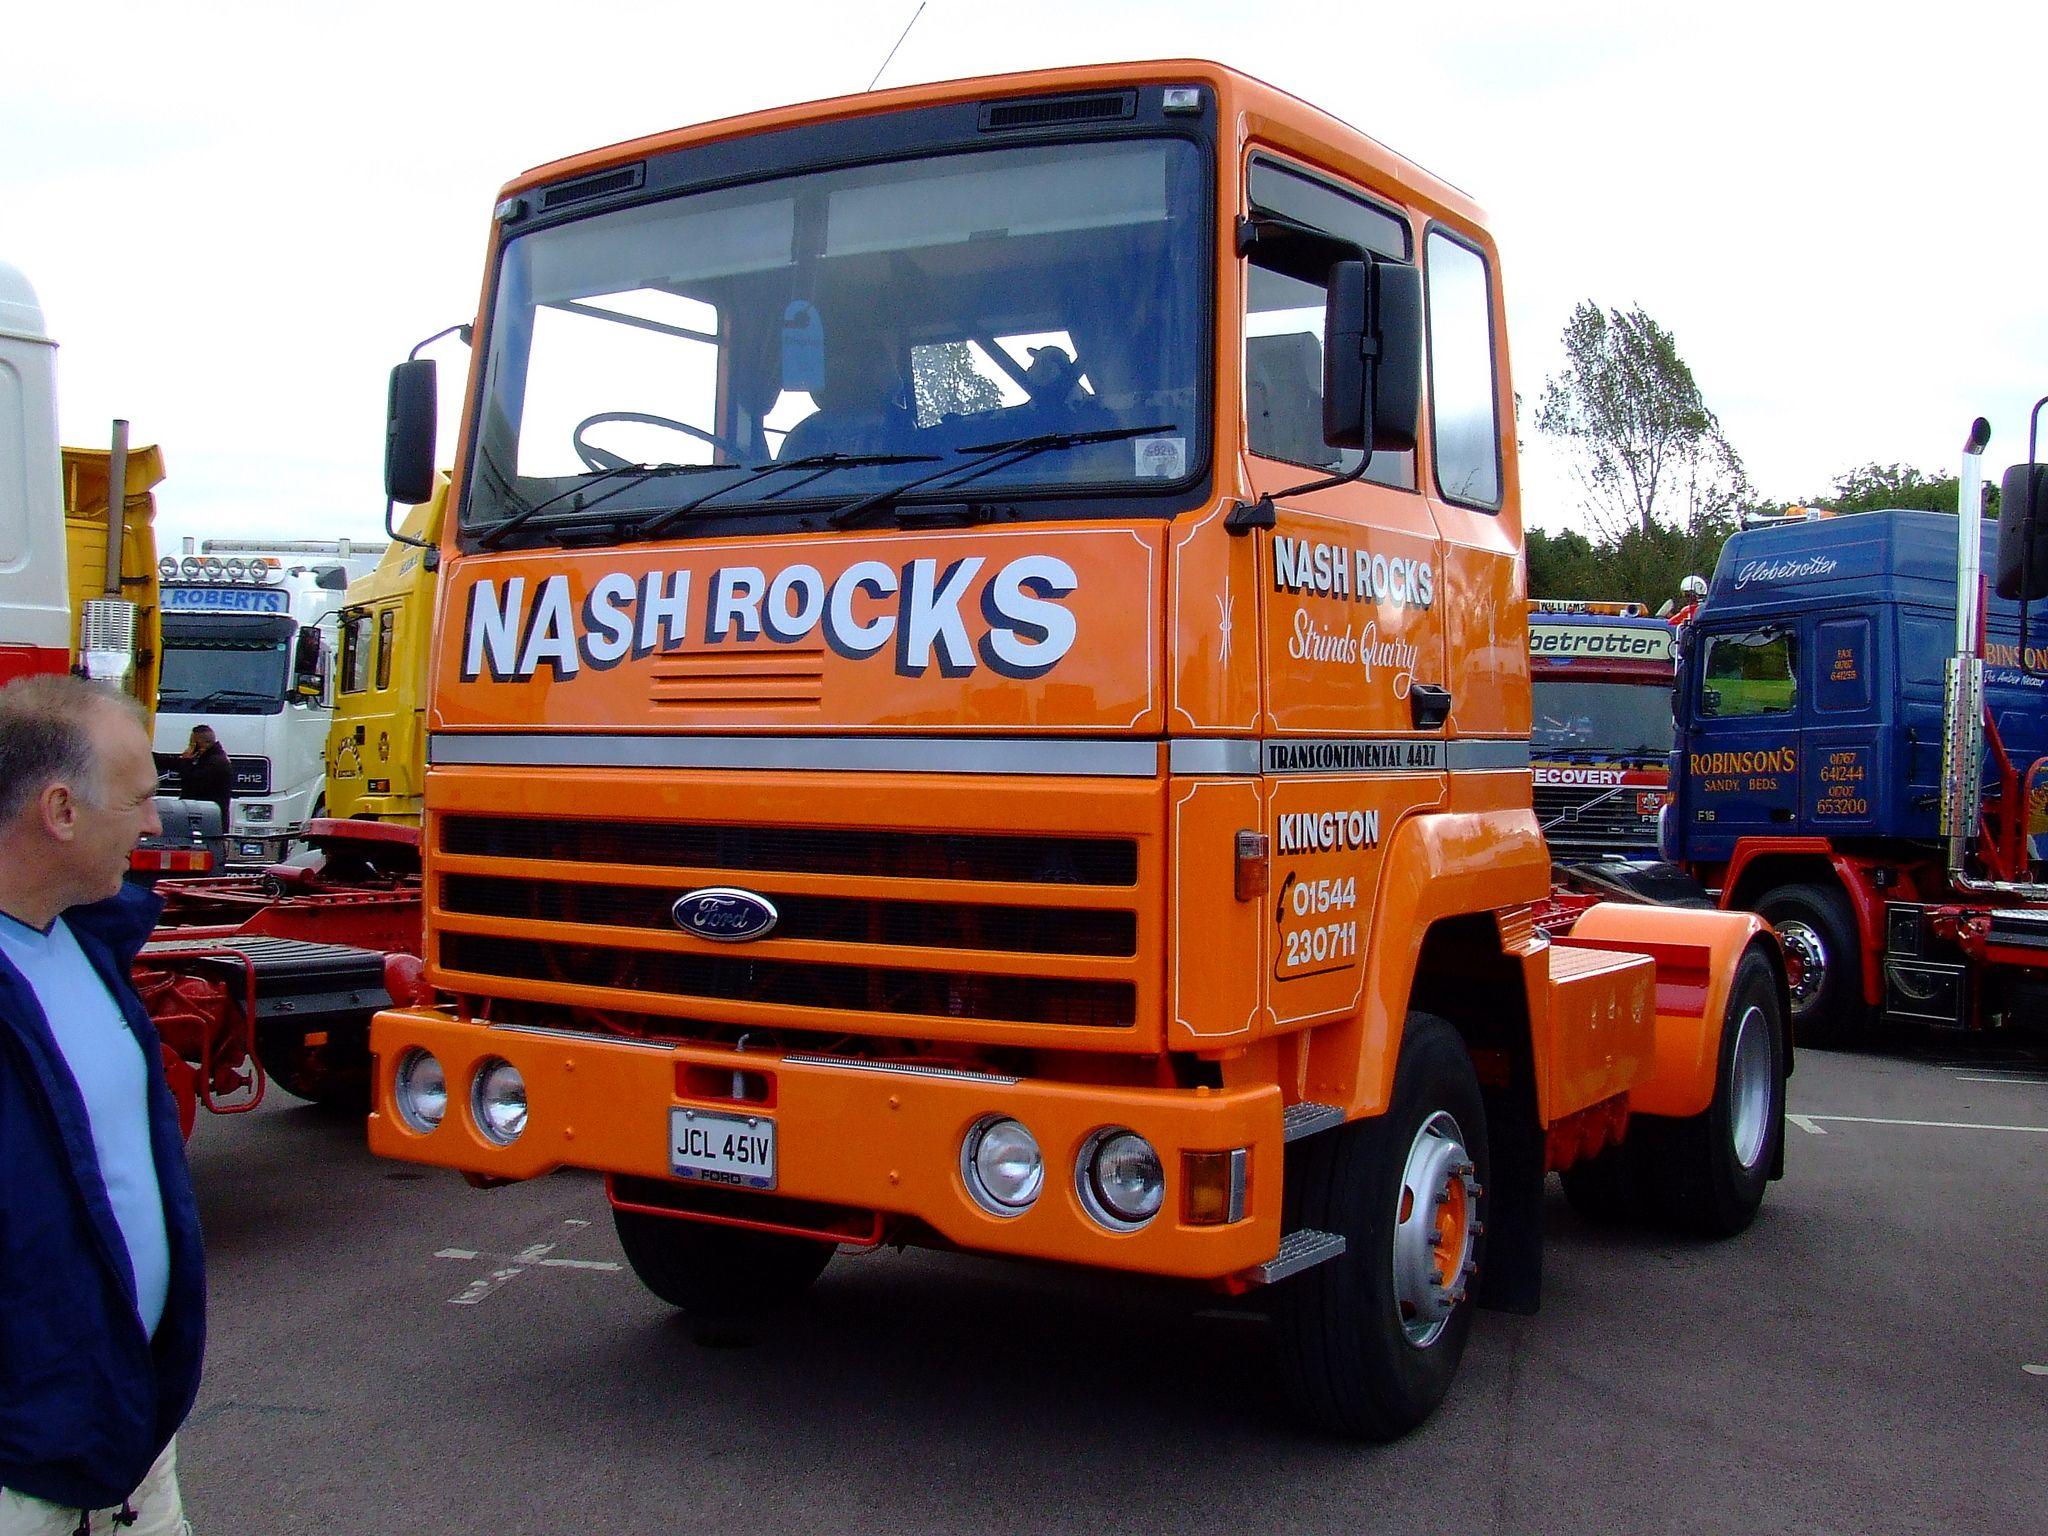 Nash rocks ford transcontinental OLDTIMER TRUCKS